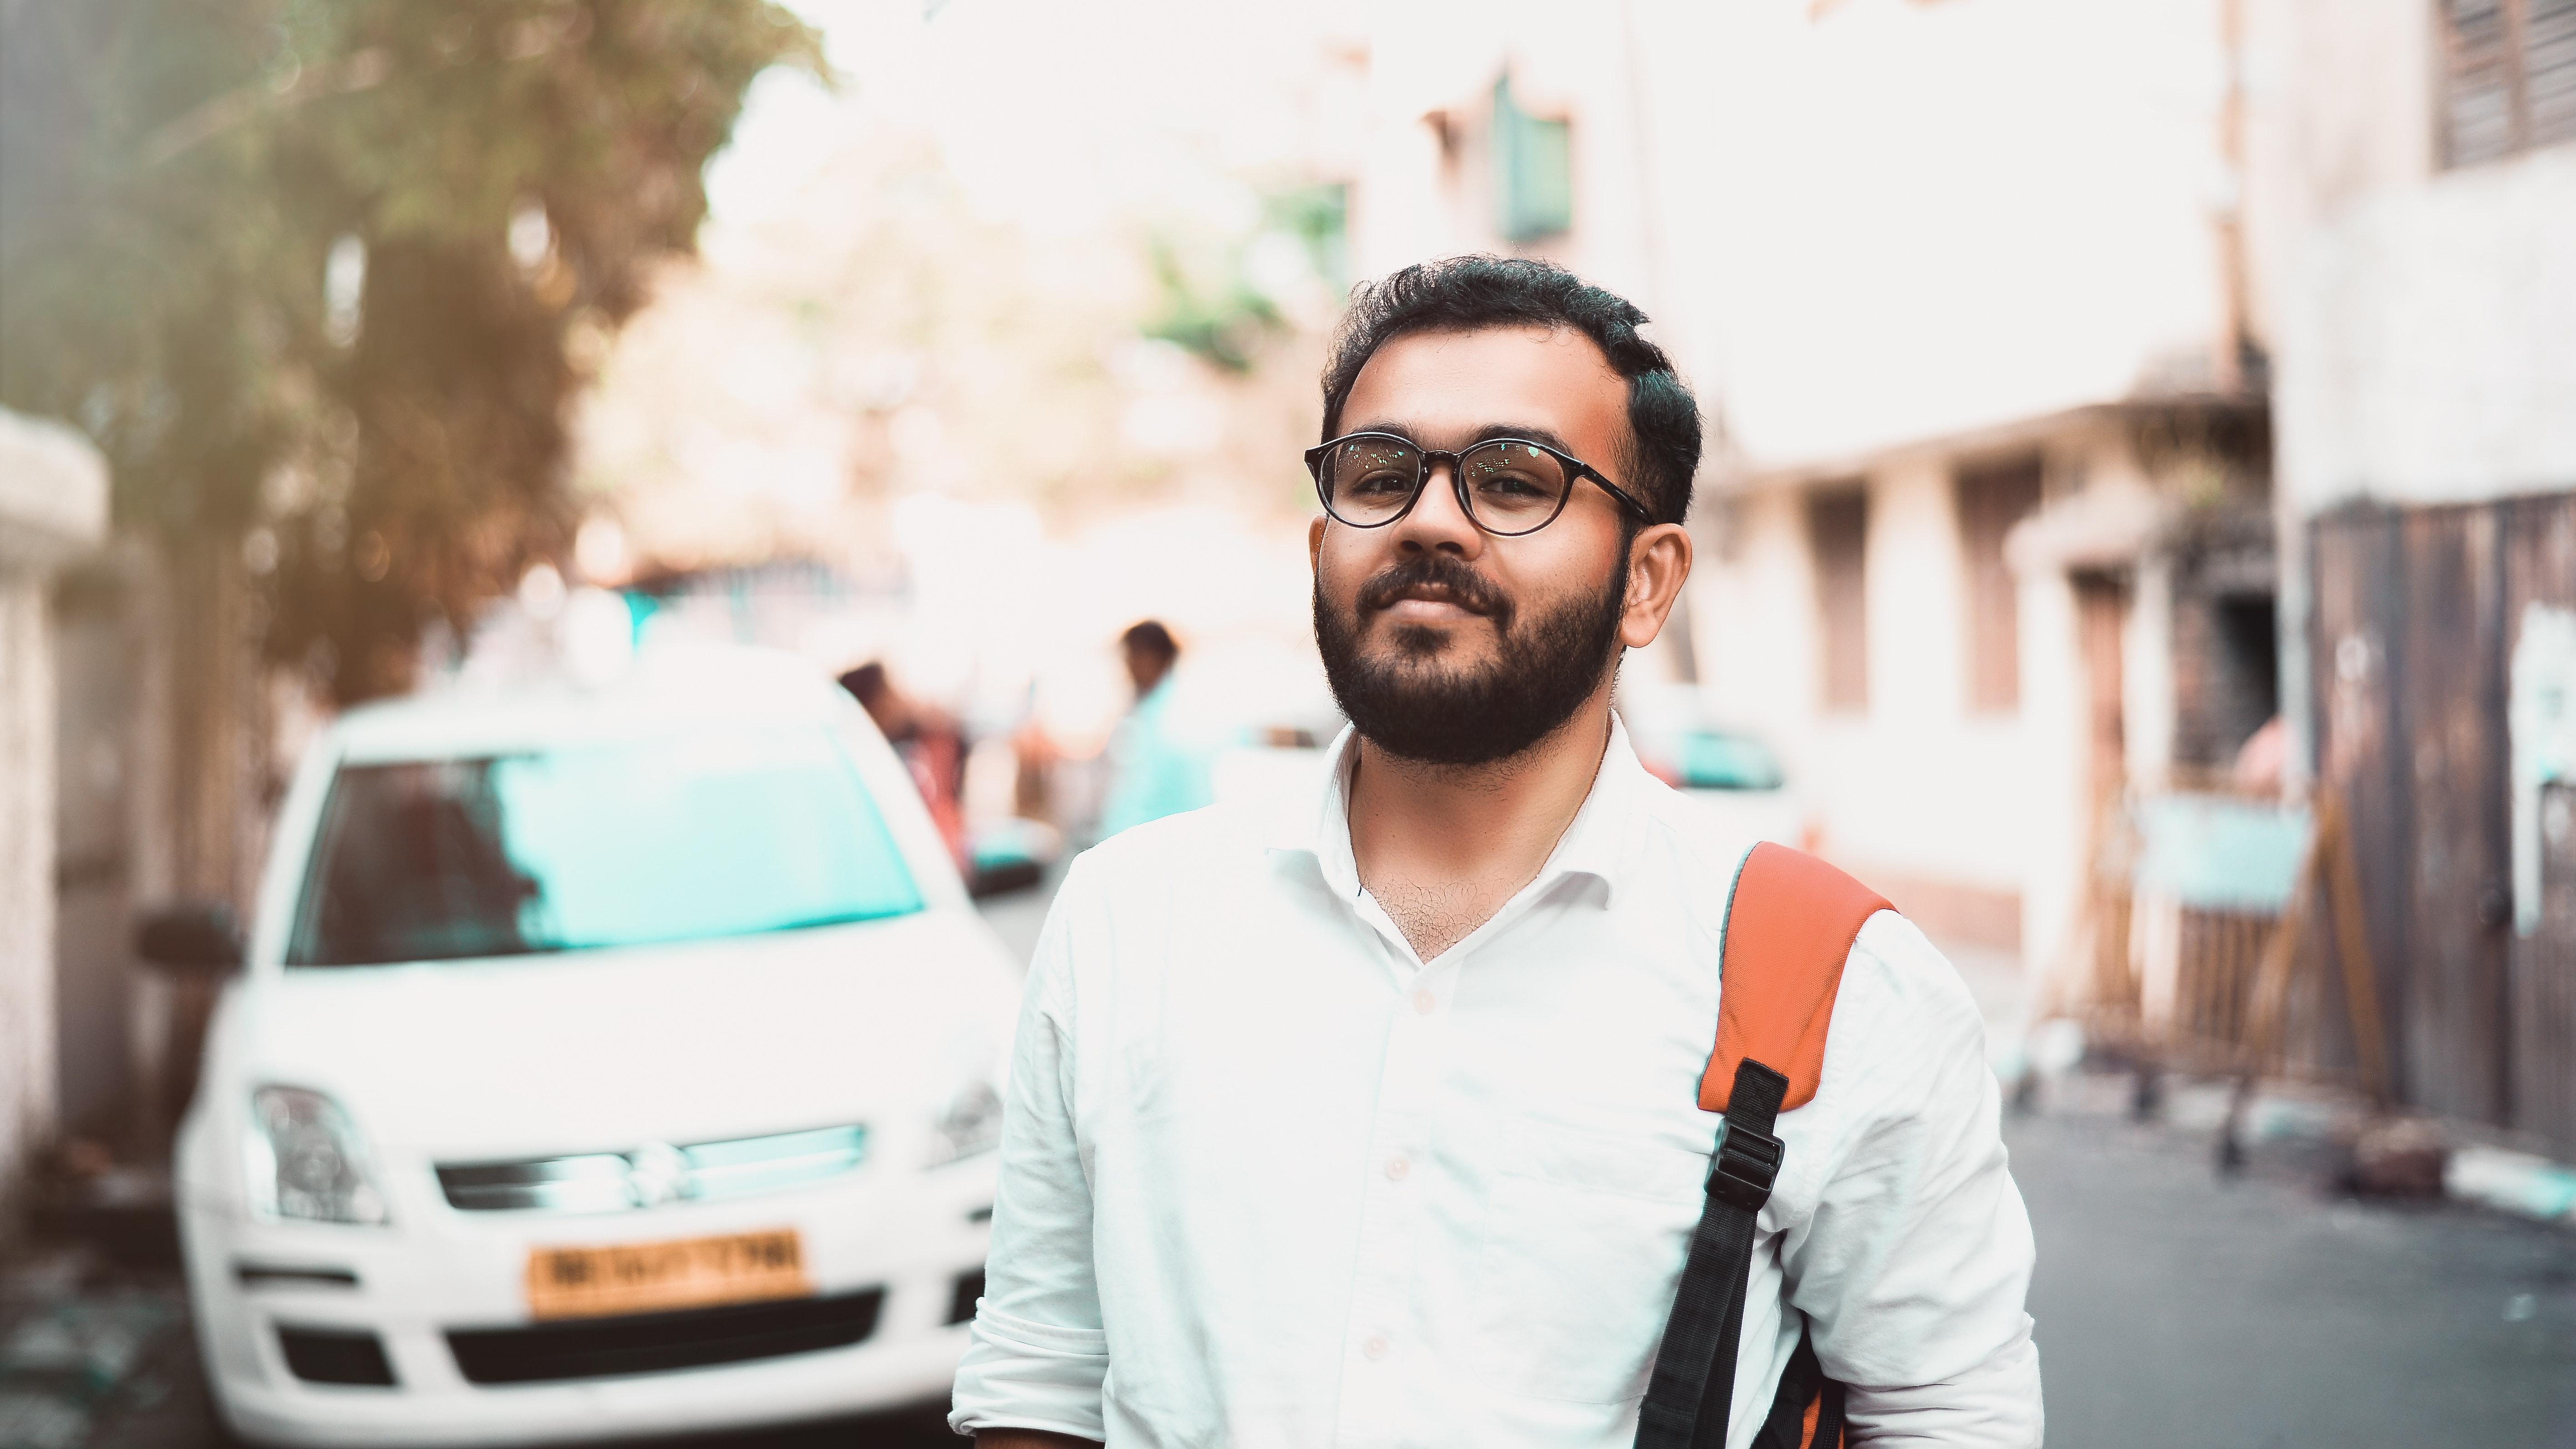 Man in White Dress Shirt, Blurred background, Car, Daylight, Eyewear, HQ Photo